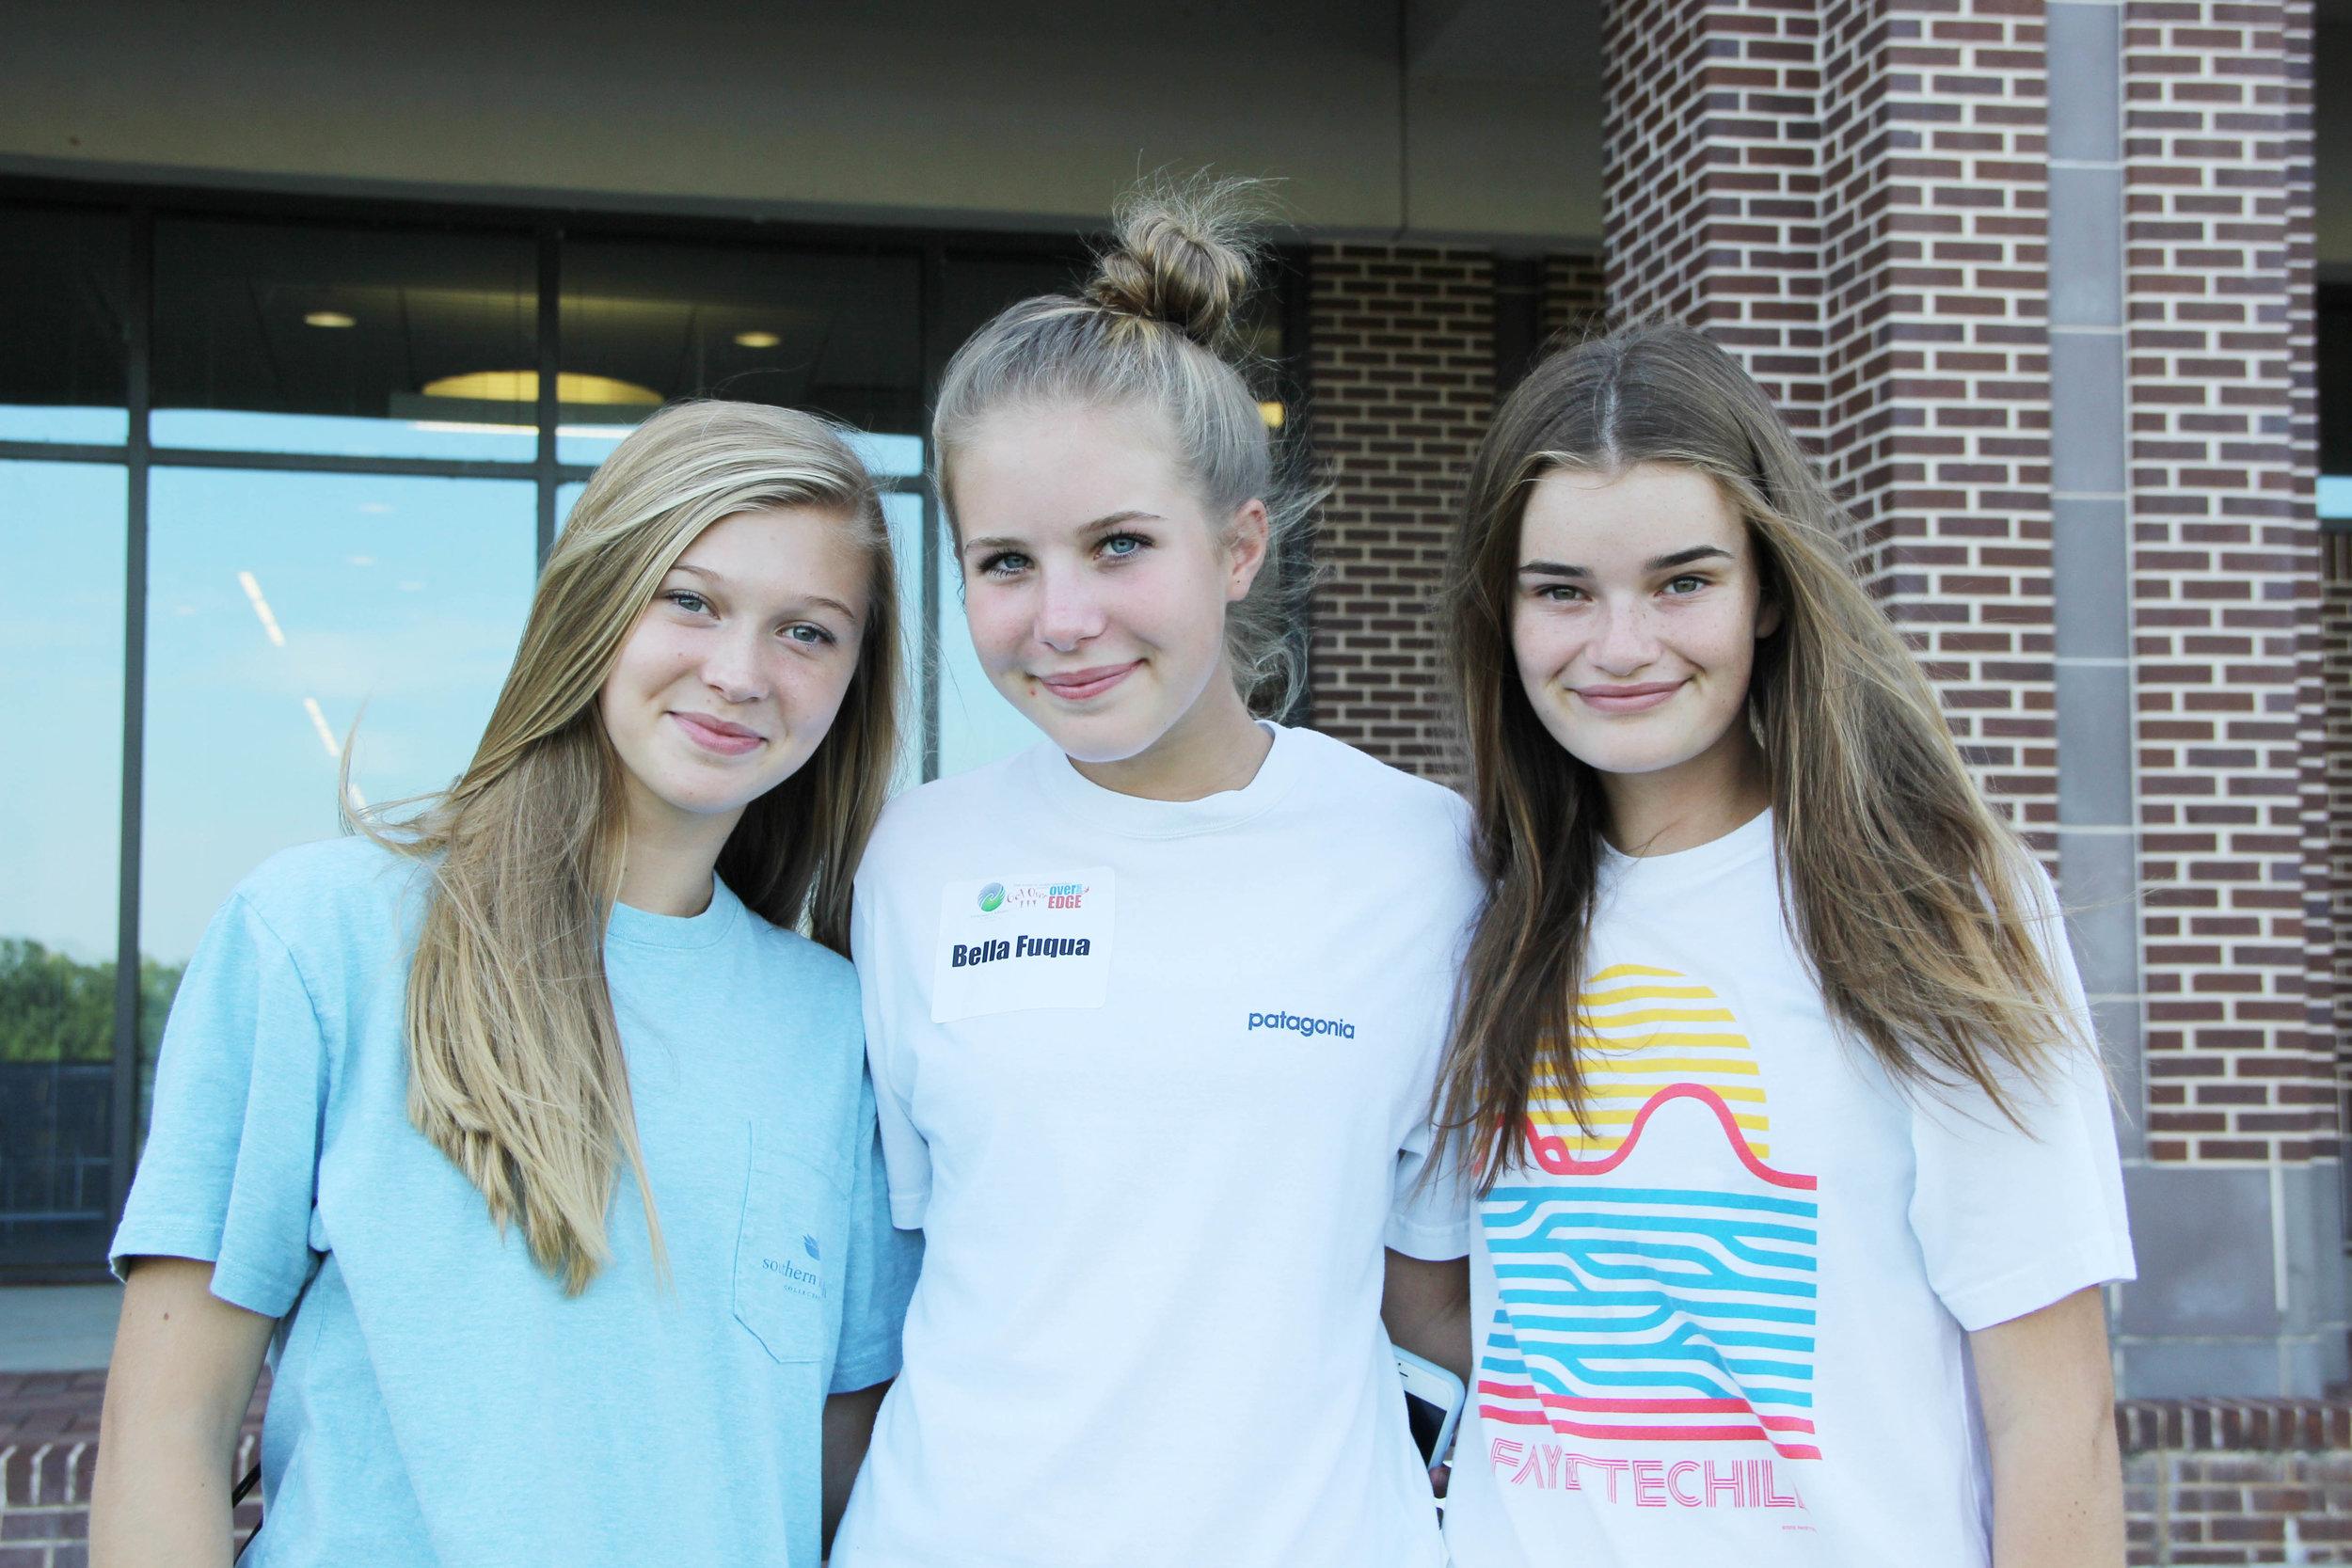 Bella Murdock, Bella Fuqua and Lydia Lee